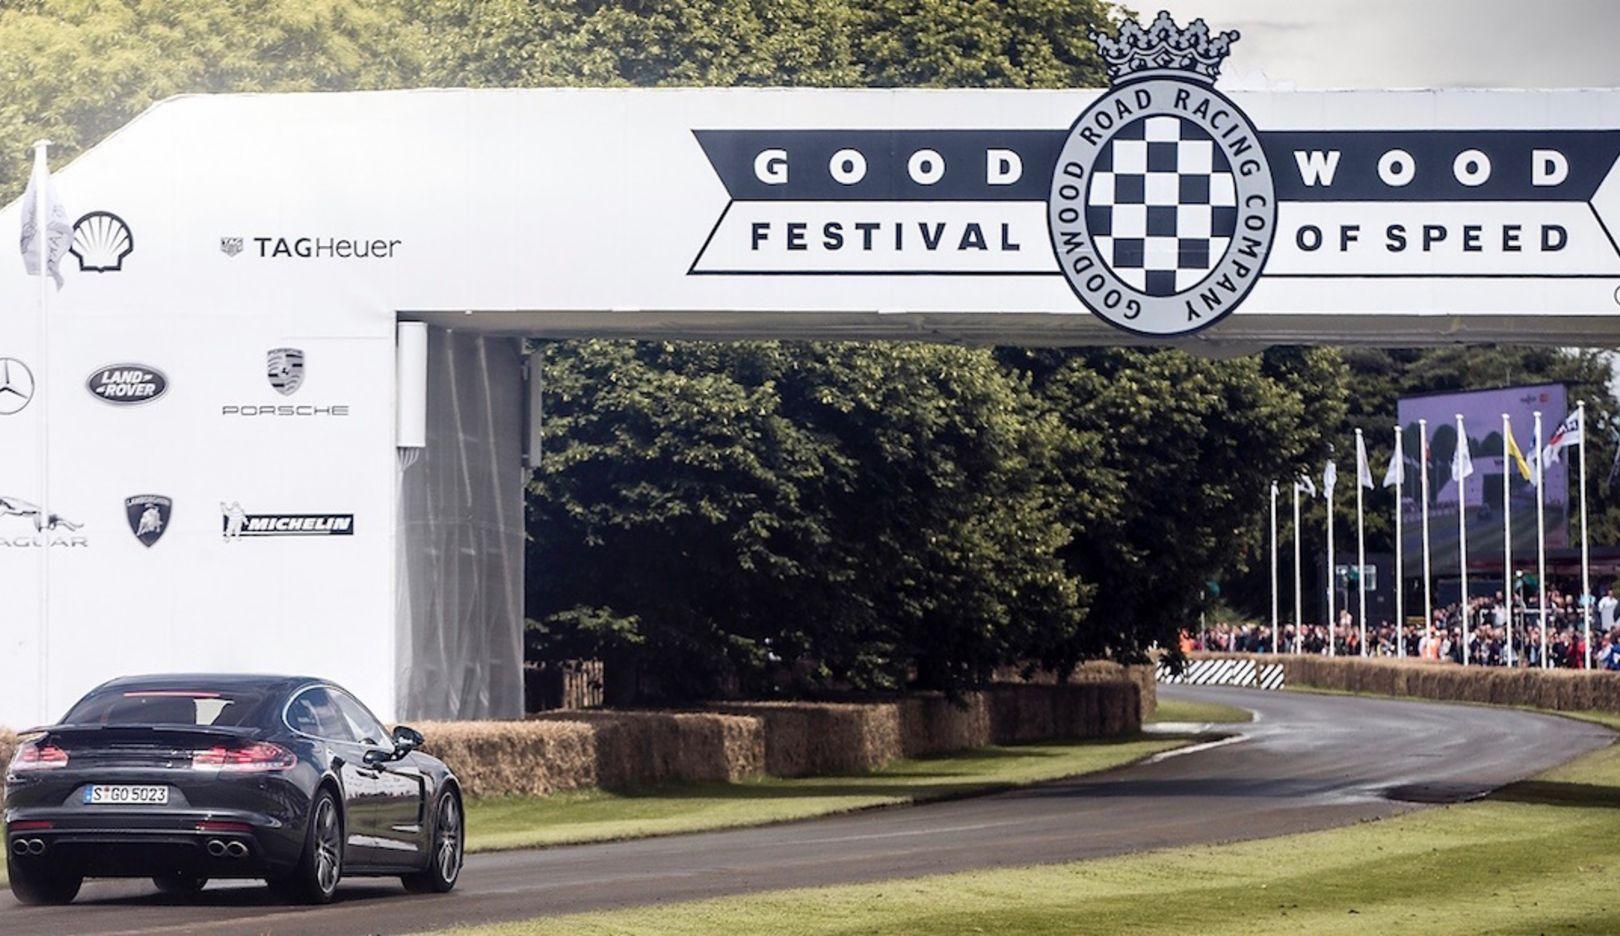 Panamera Turbo, Goodwood Festival, 2016, Porsche AG